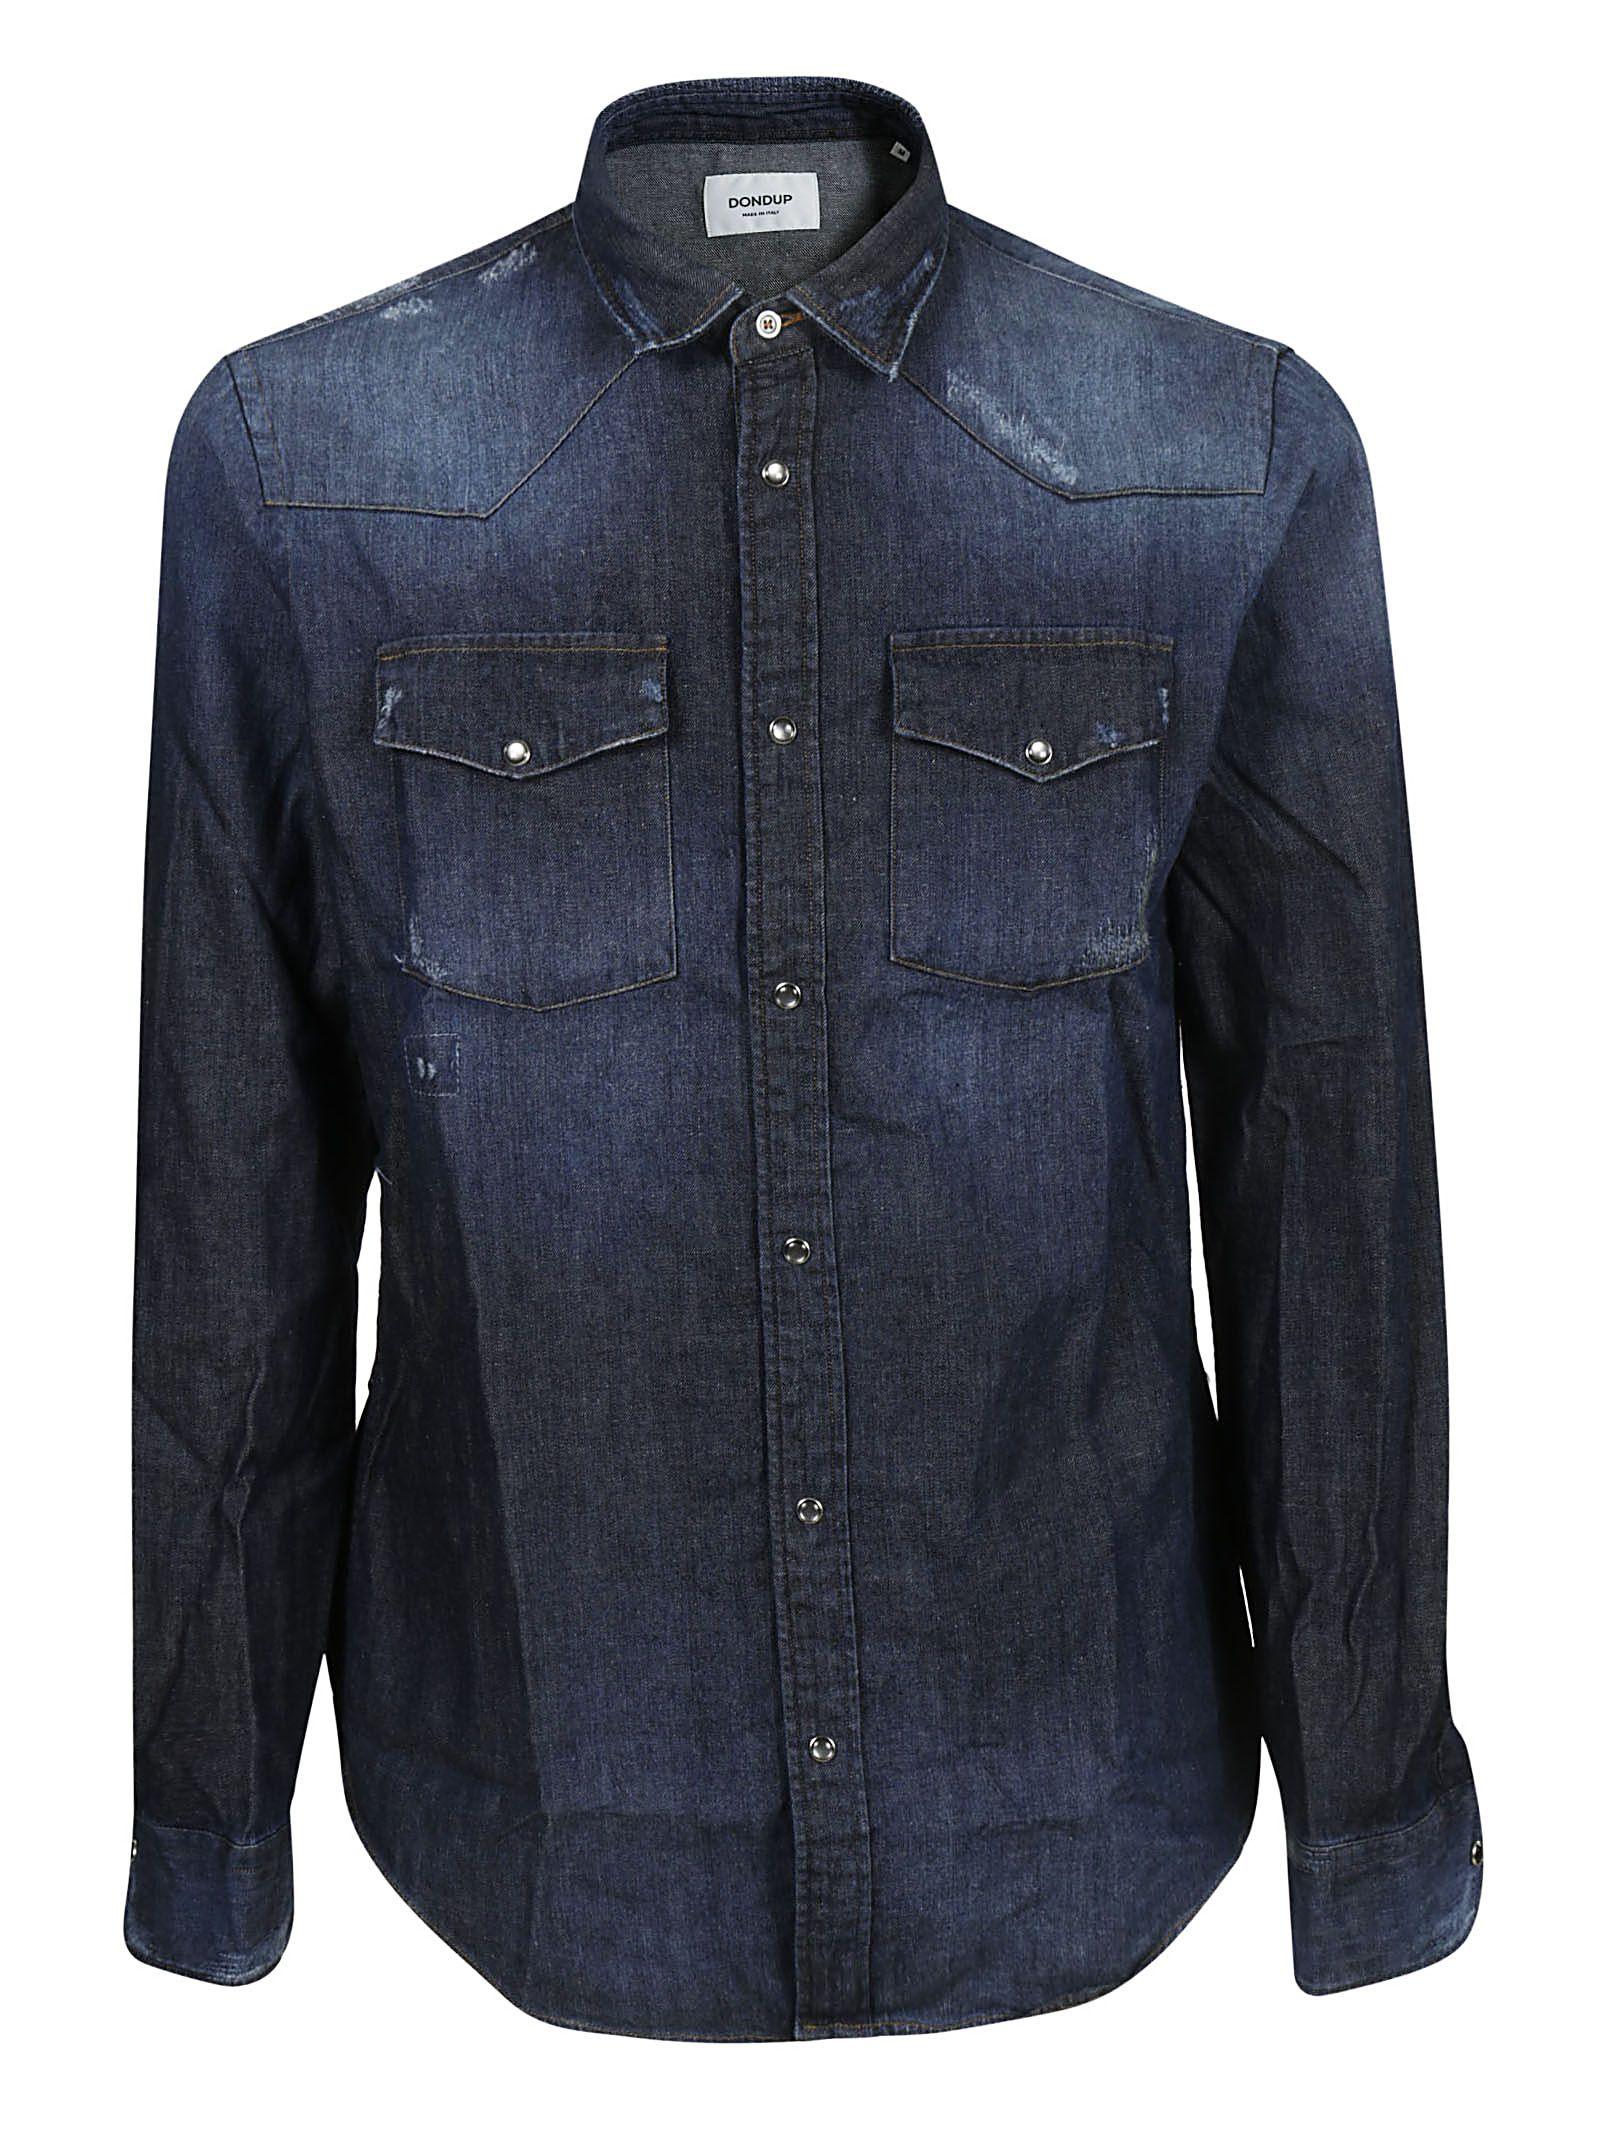 Dondup Distressed Shirt